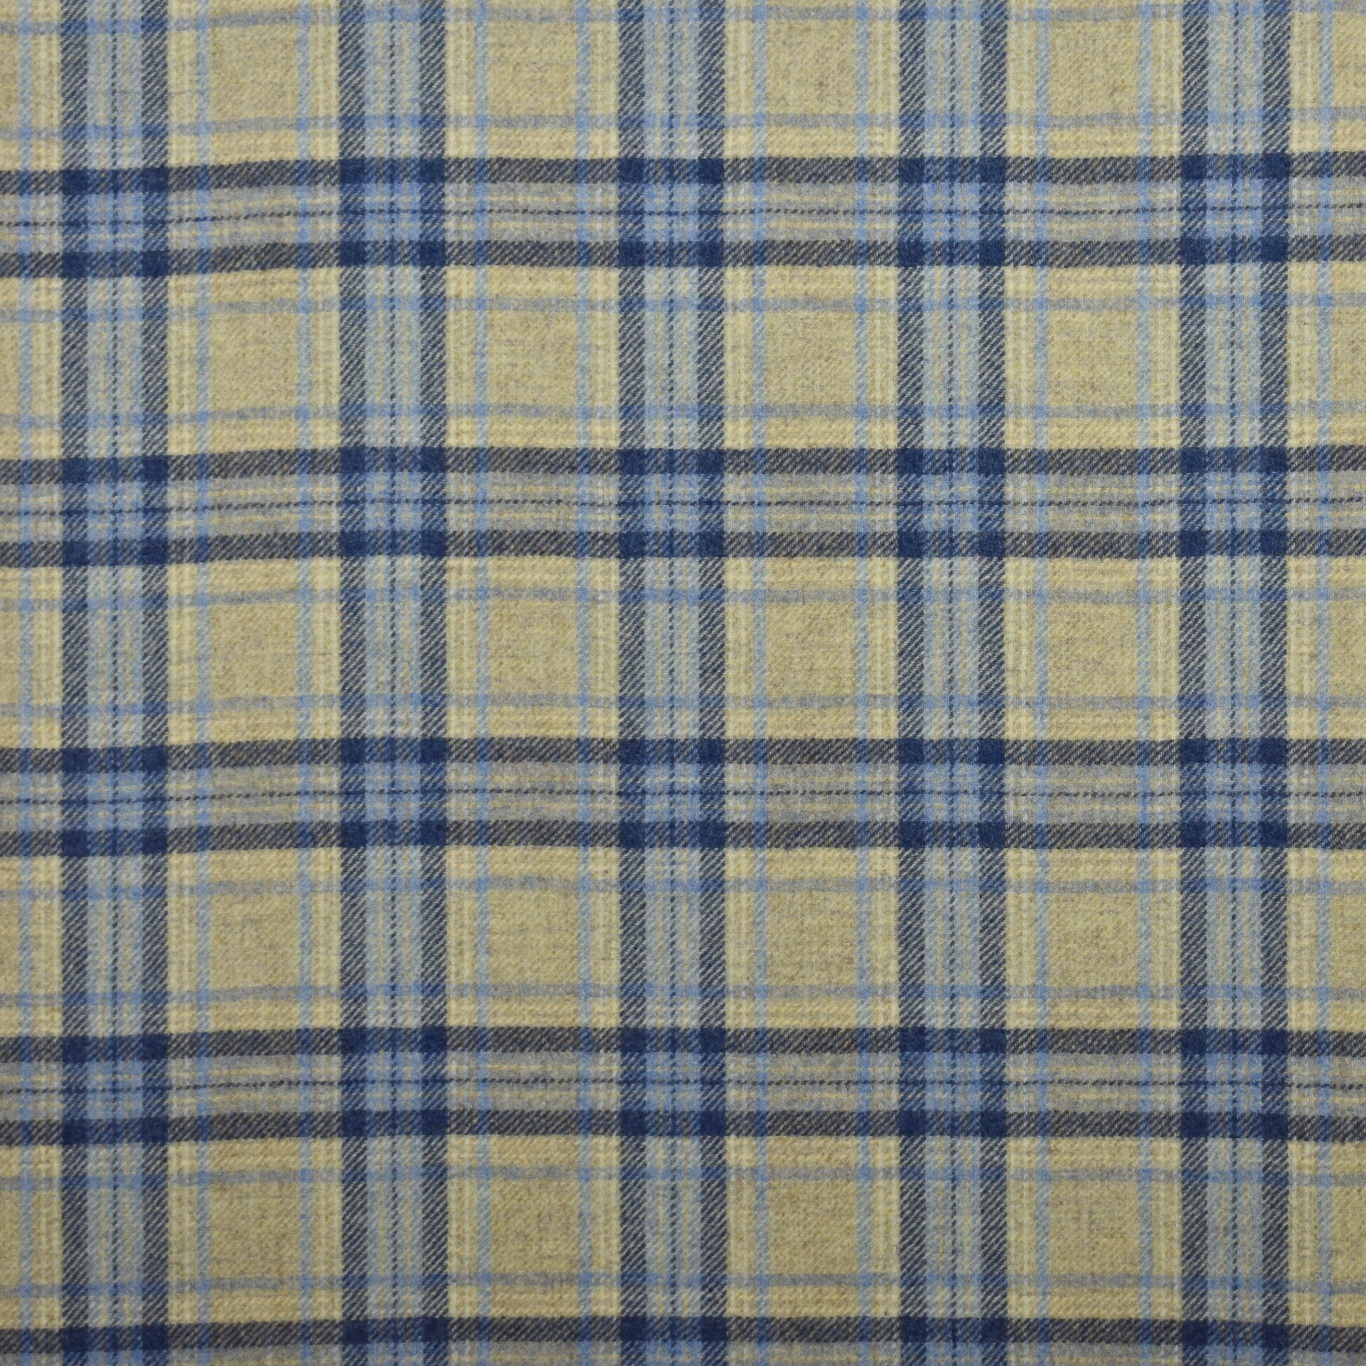 Image of Abraham Moon Barony Denim Fabric 1.6m Remnant